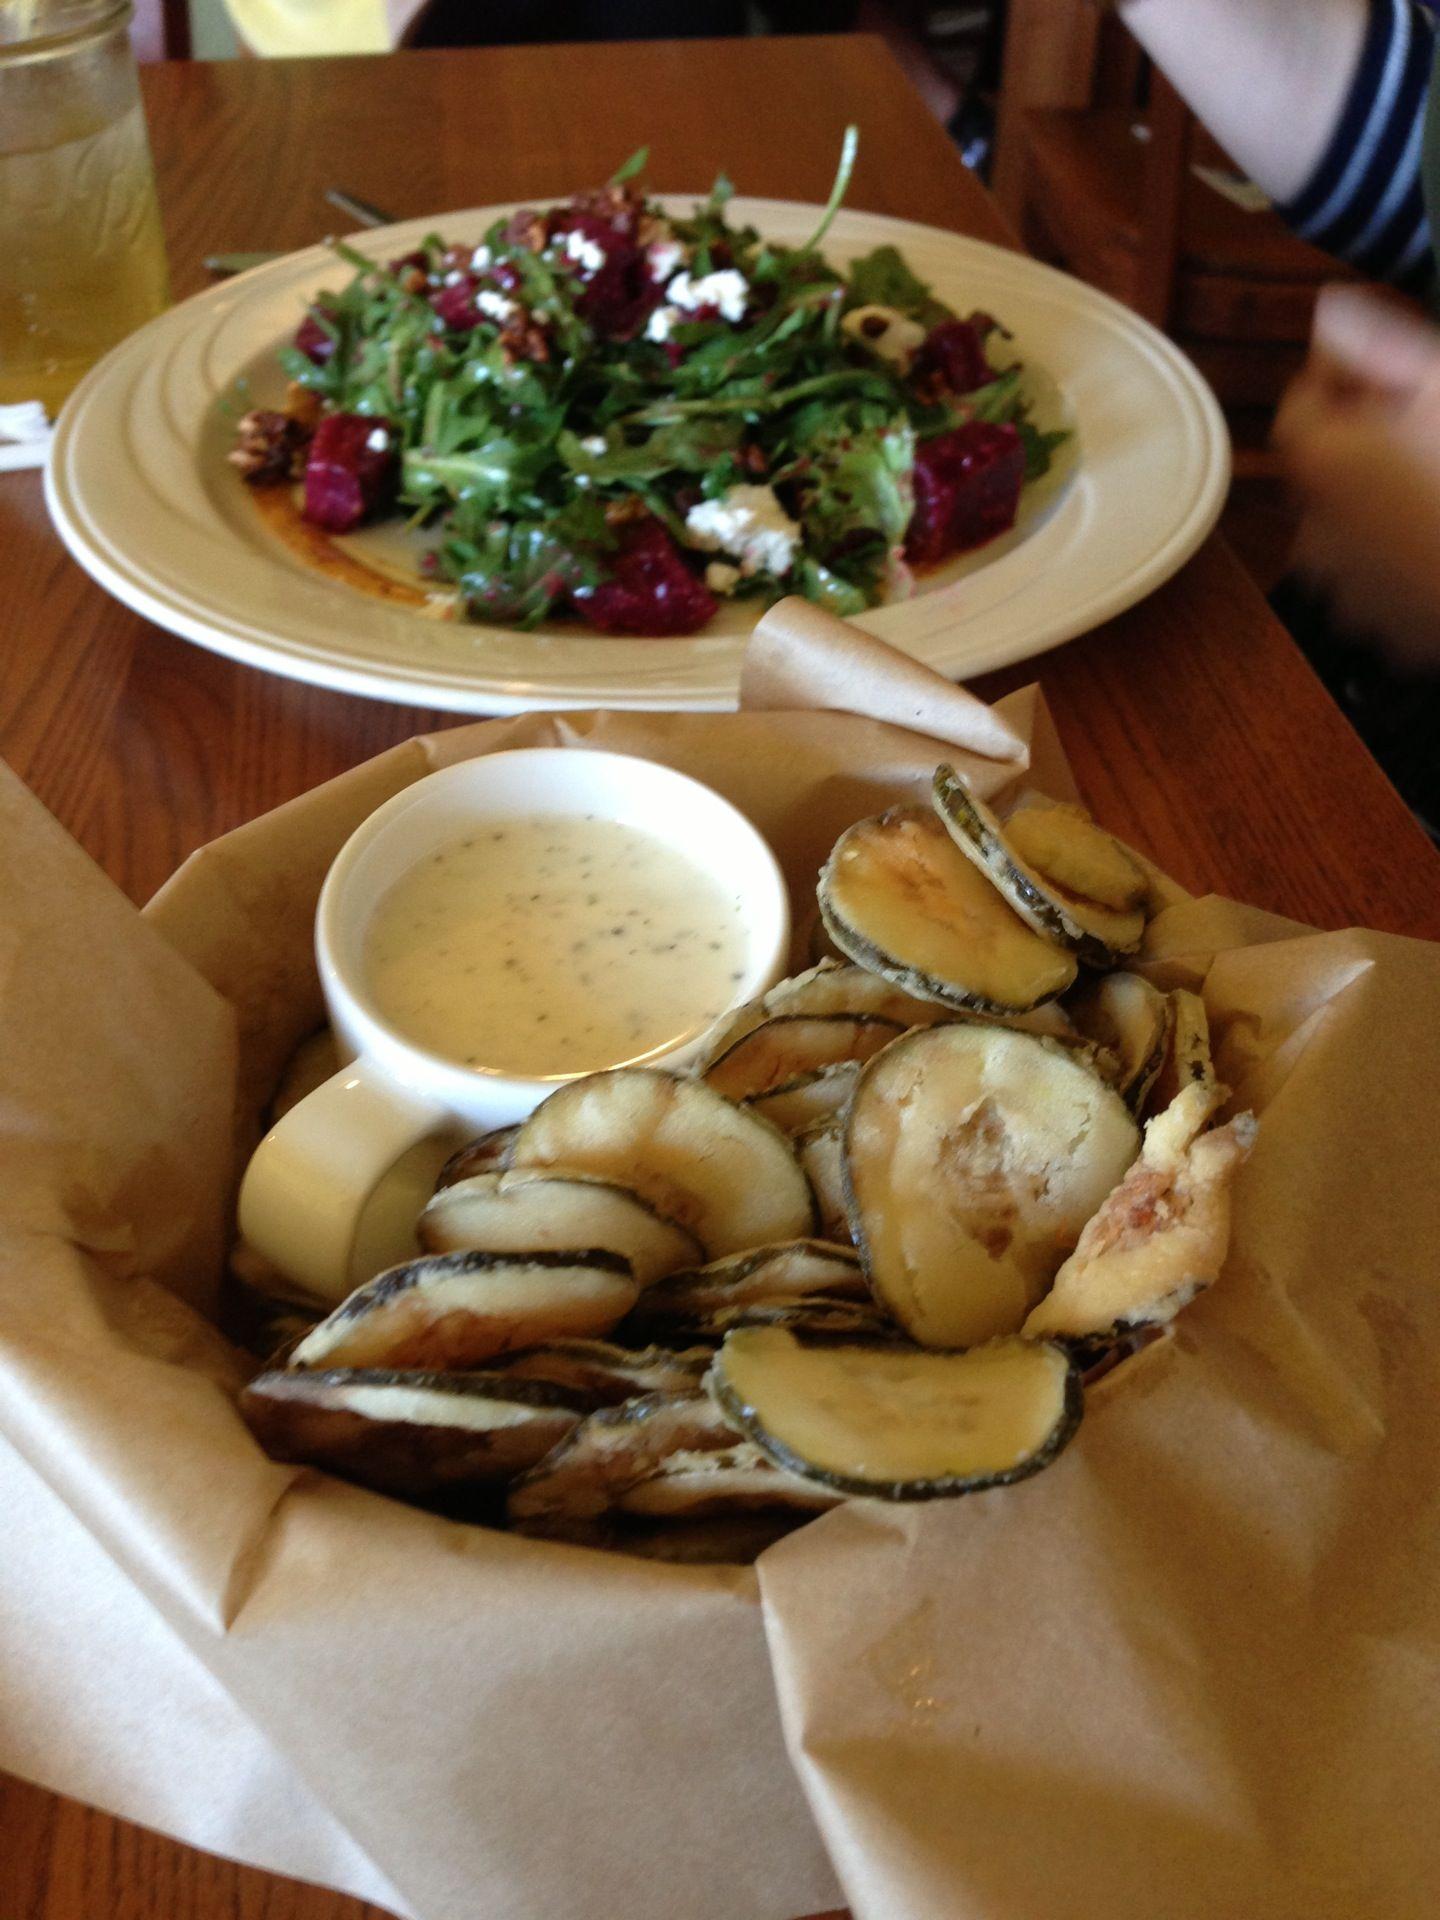 Pickle Jar Kitchen in Falmouth, MA | Explore Cape Cod | Pinterest ...